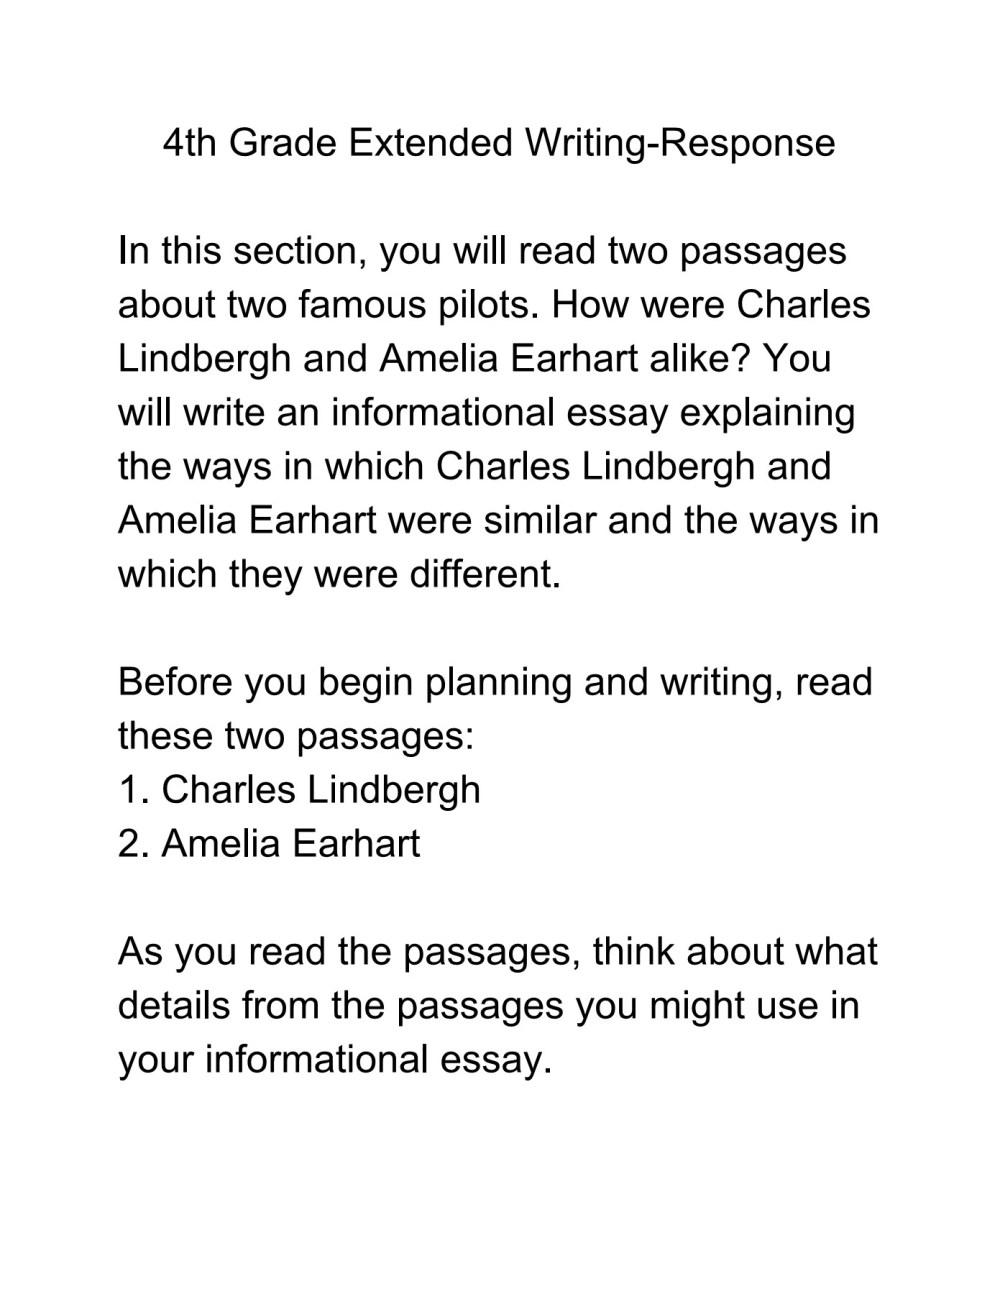 medium resolution of 4th Grade Writing Passages Mock 2-Flip eBook Pages 1 - 5  AnyFlip   AnyFlip